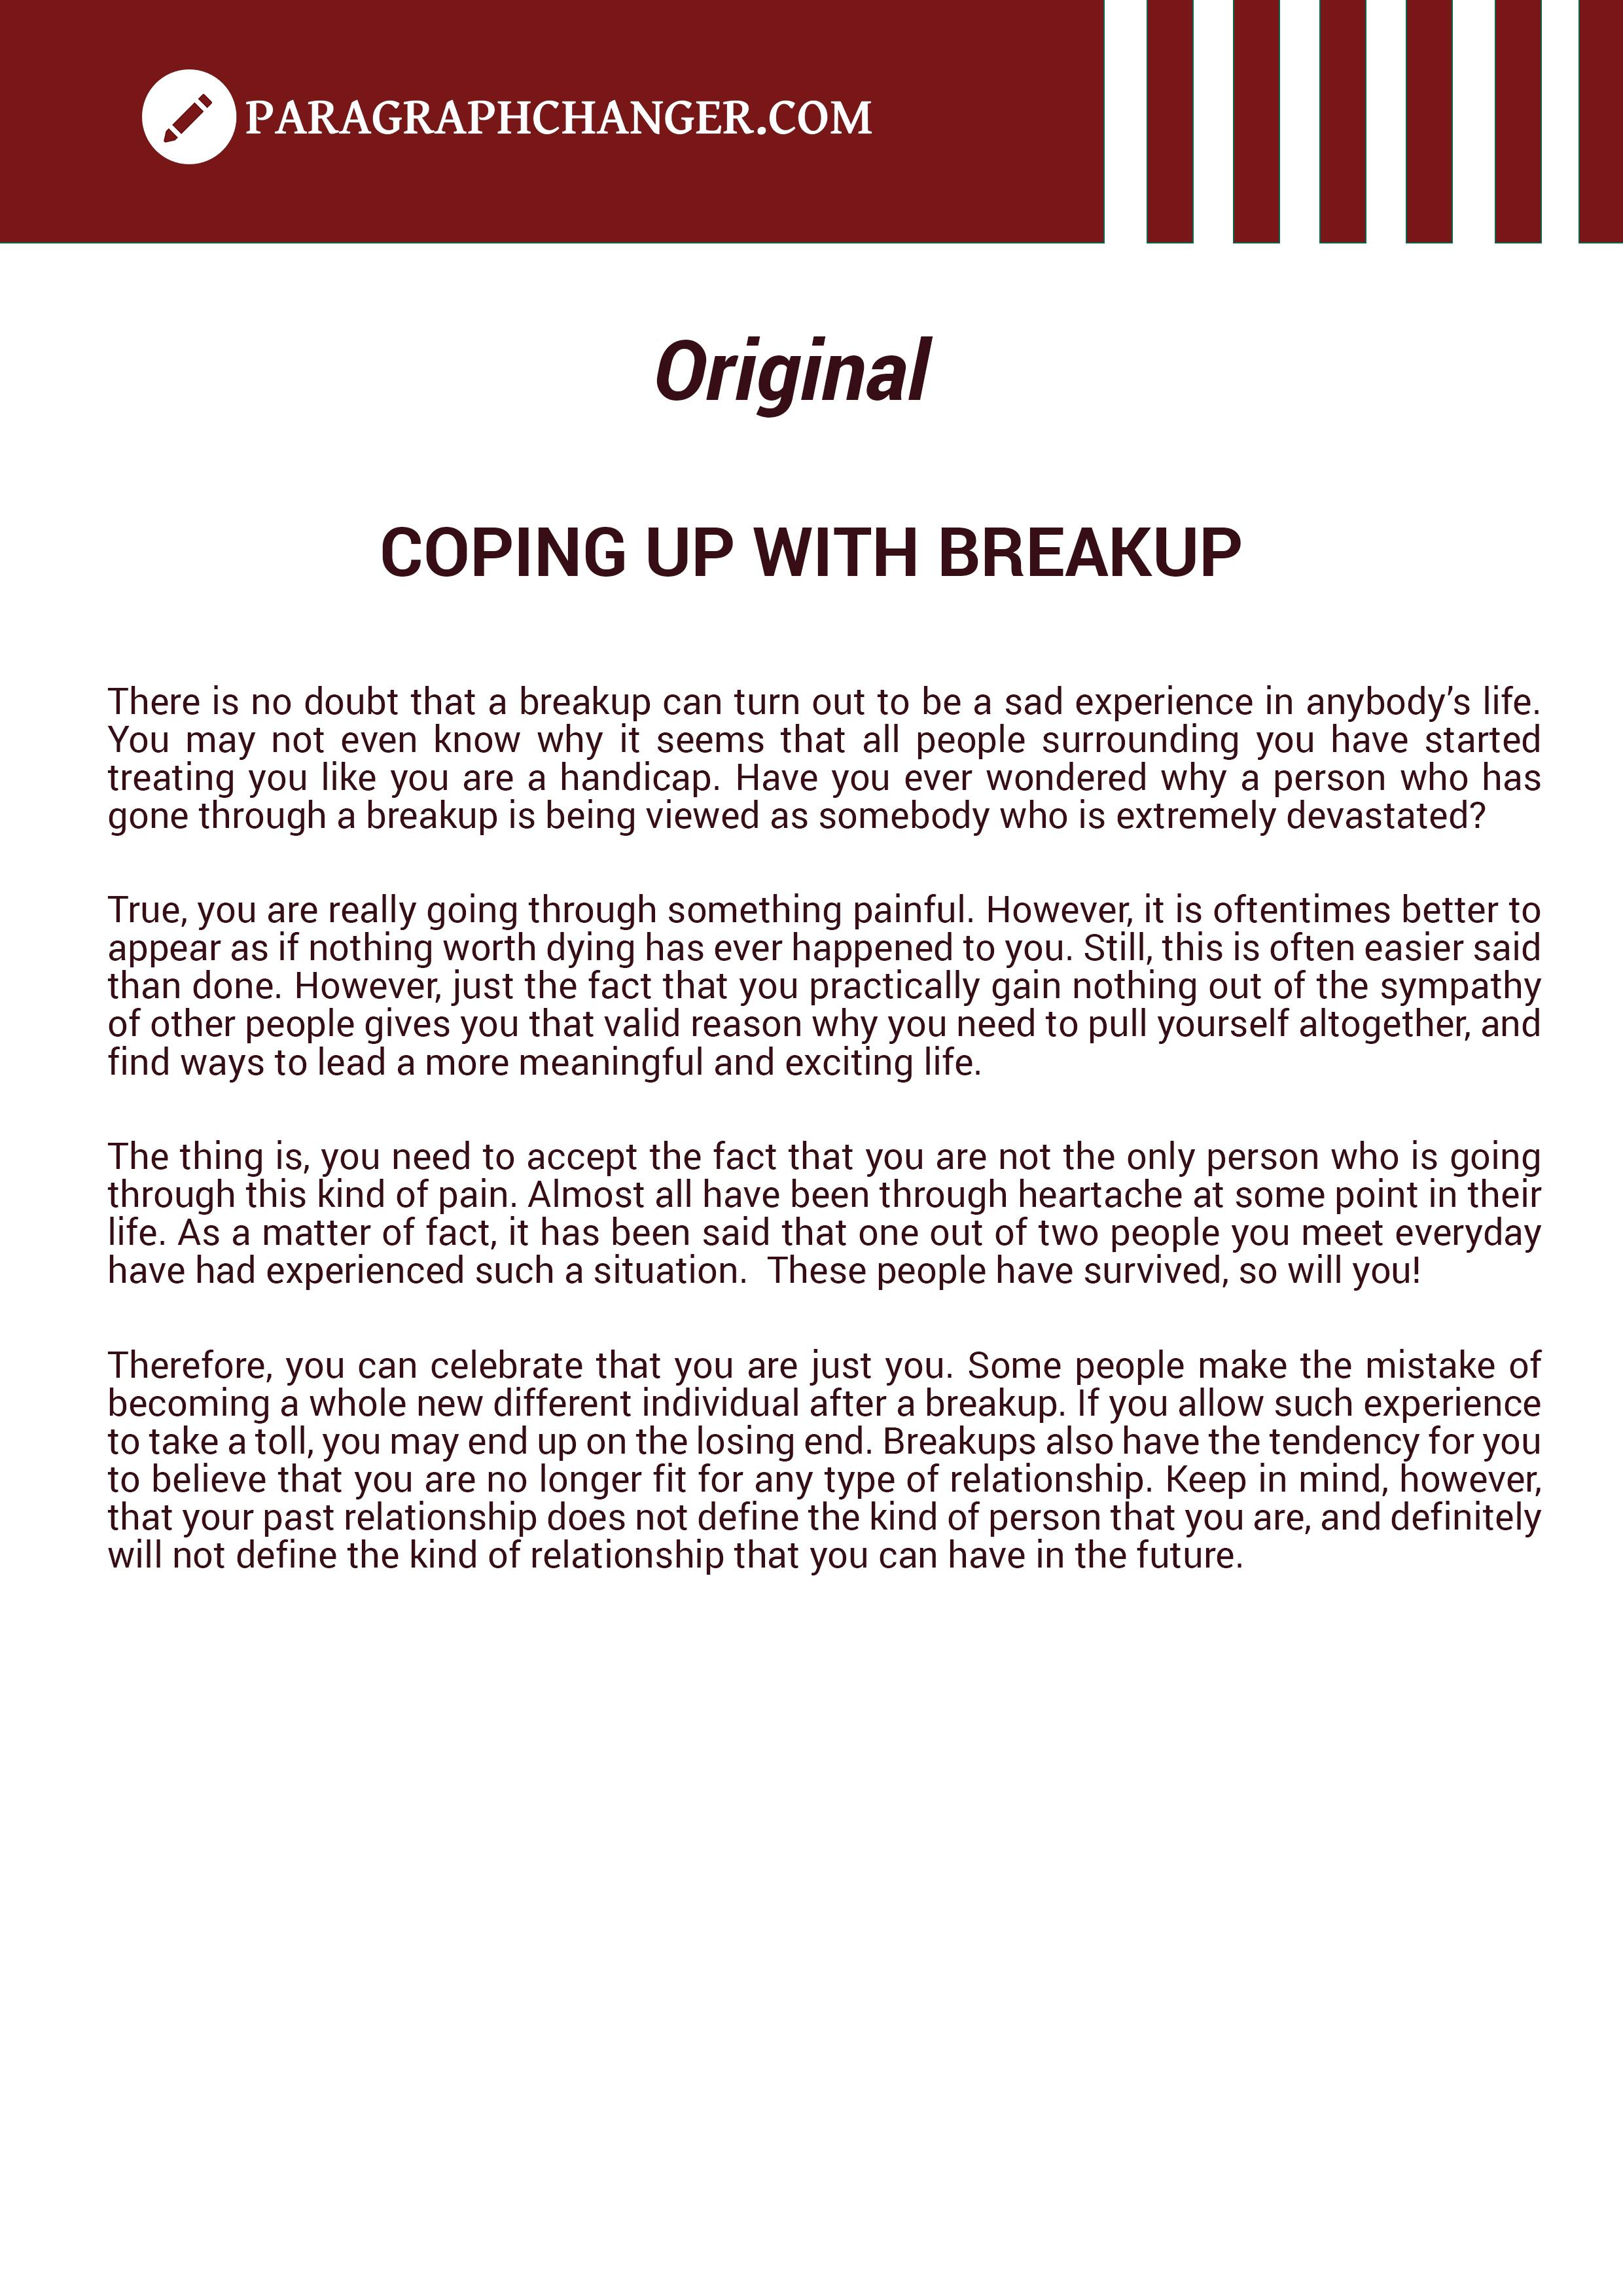 Paraphrasing Sample - Original Text